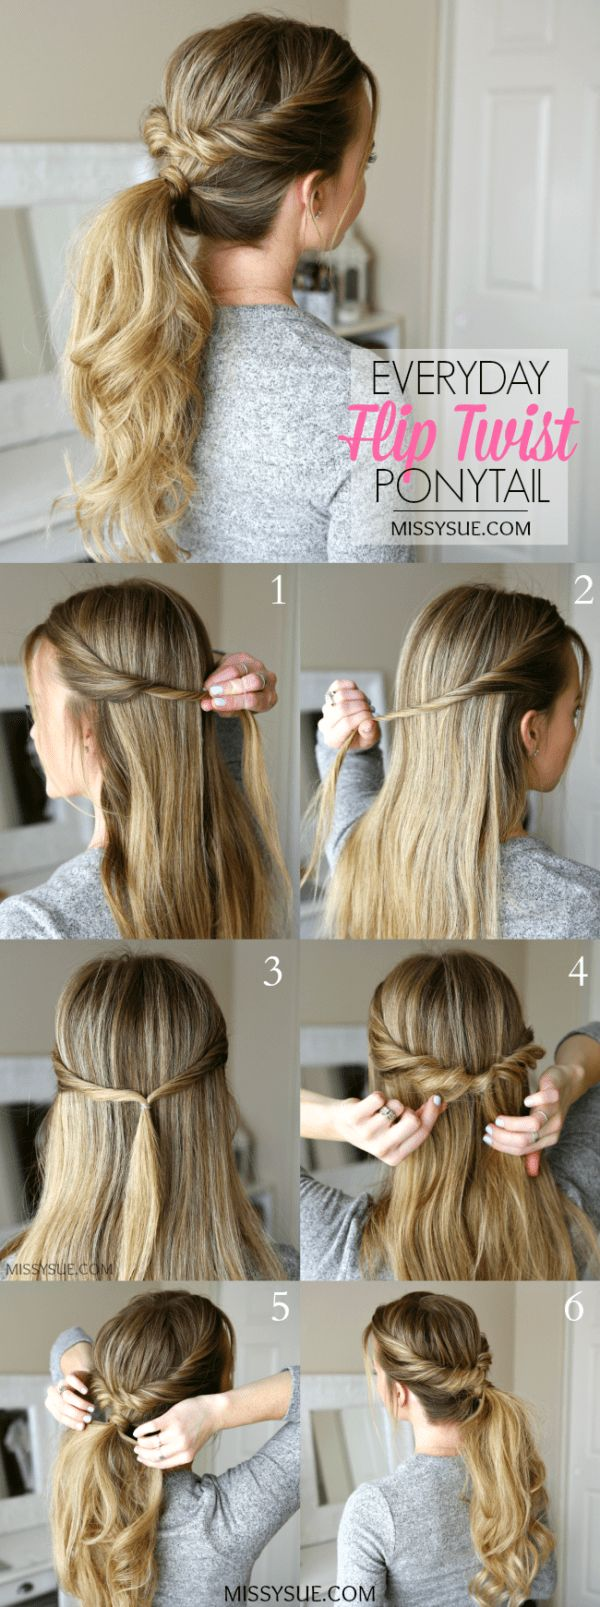 best hair styles images on Pinterest Hairstyle ideas Hair ideas